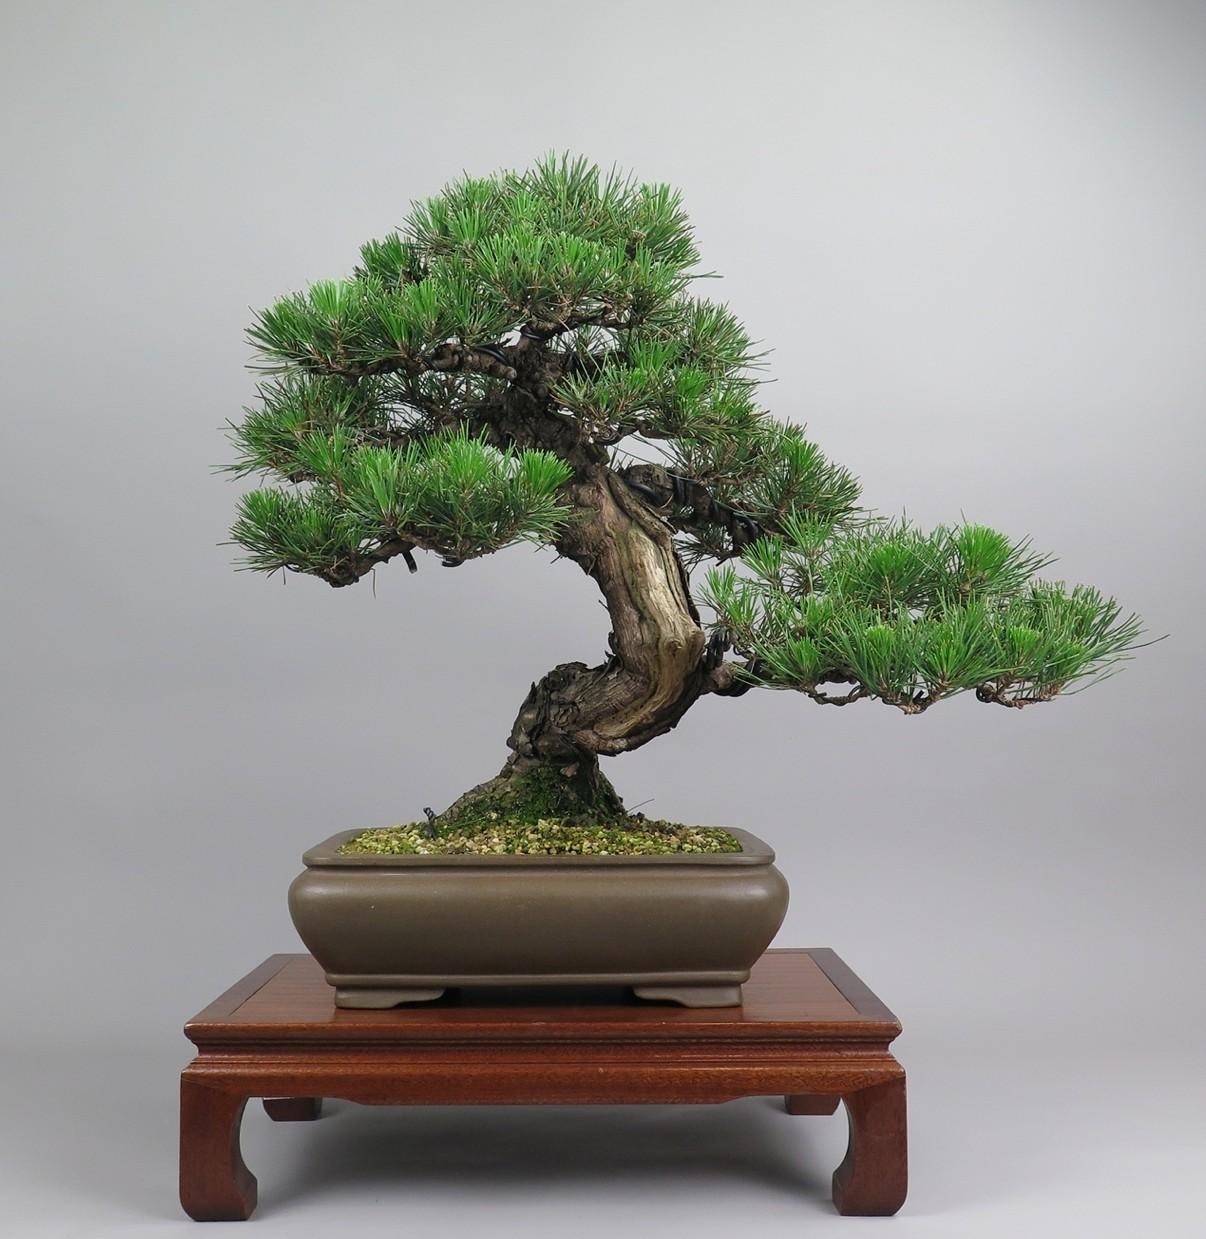 Bonsai de Pinus tumbergii, frente